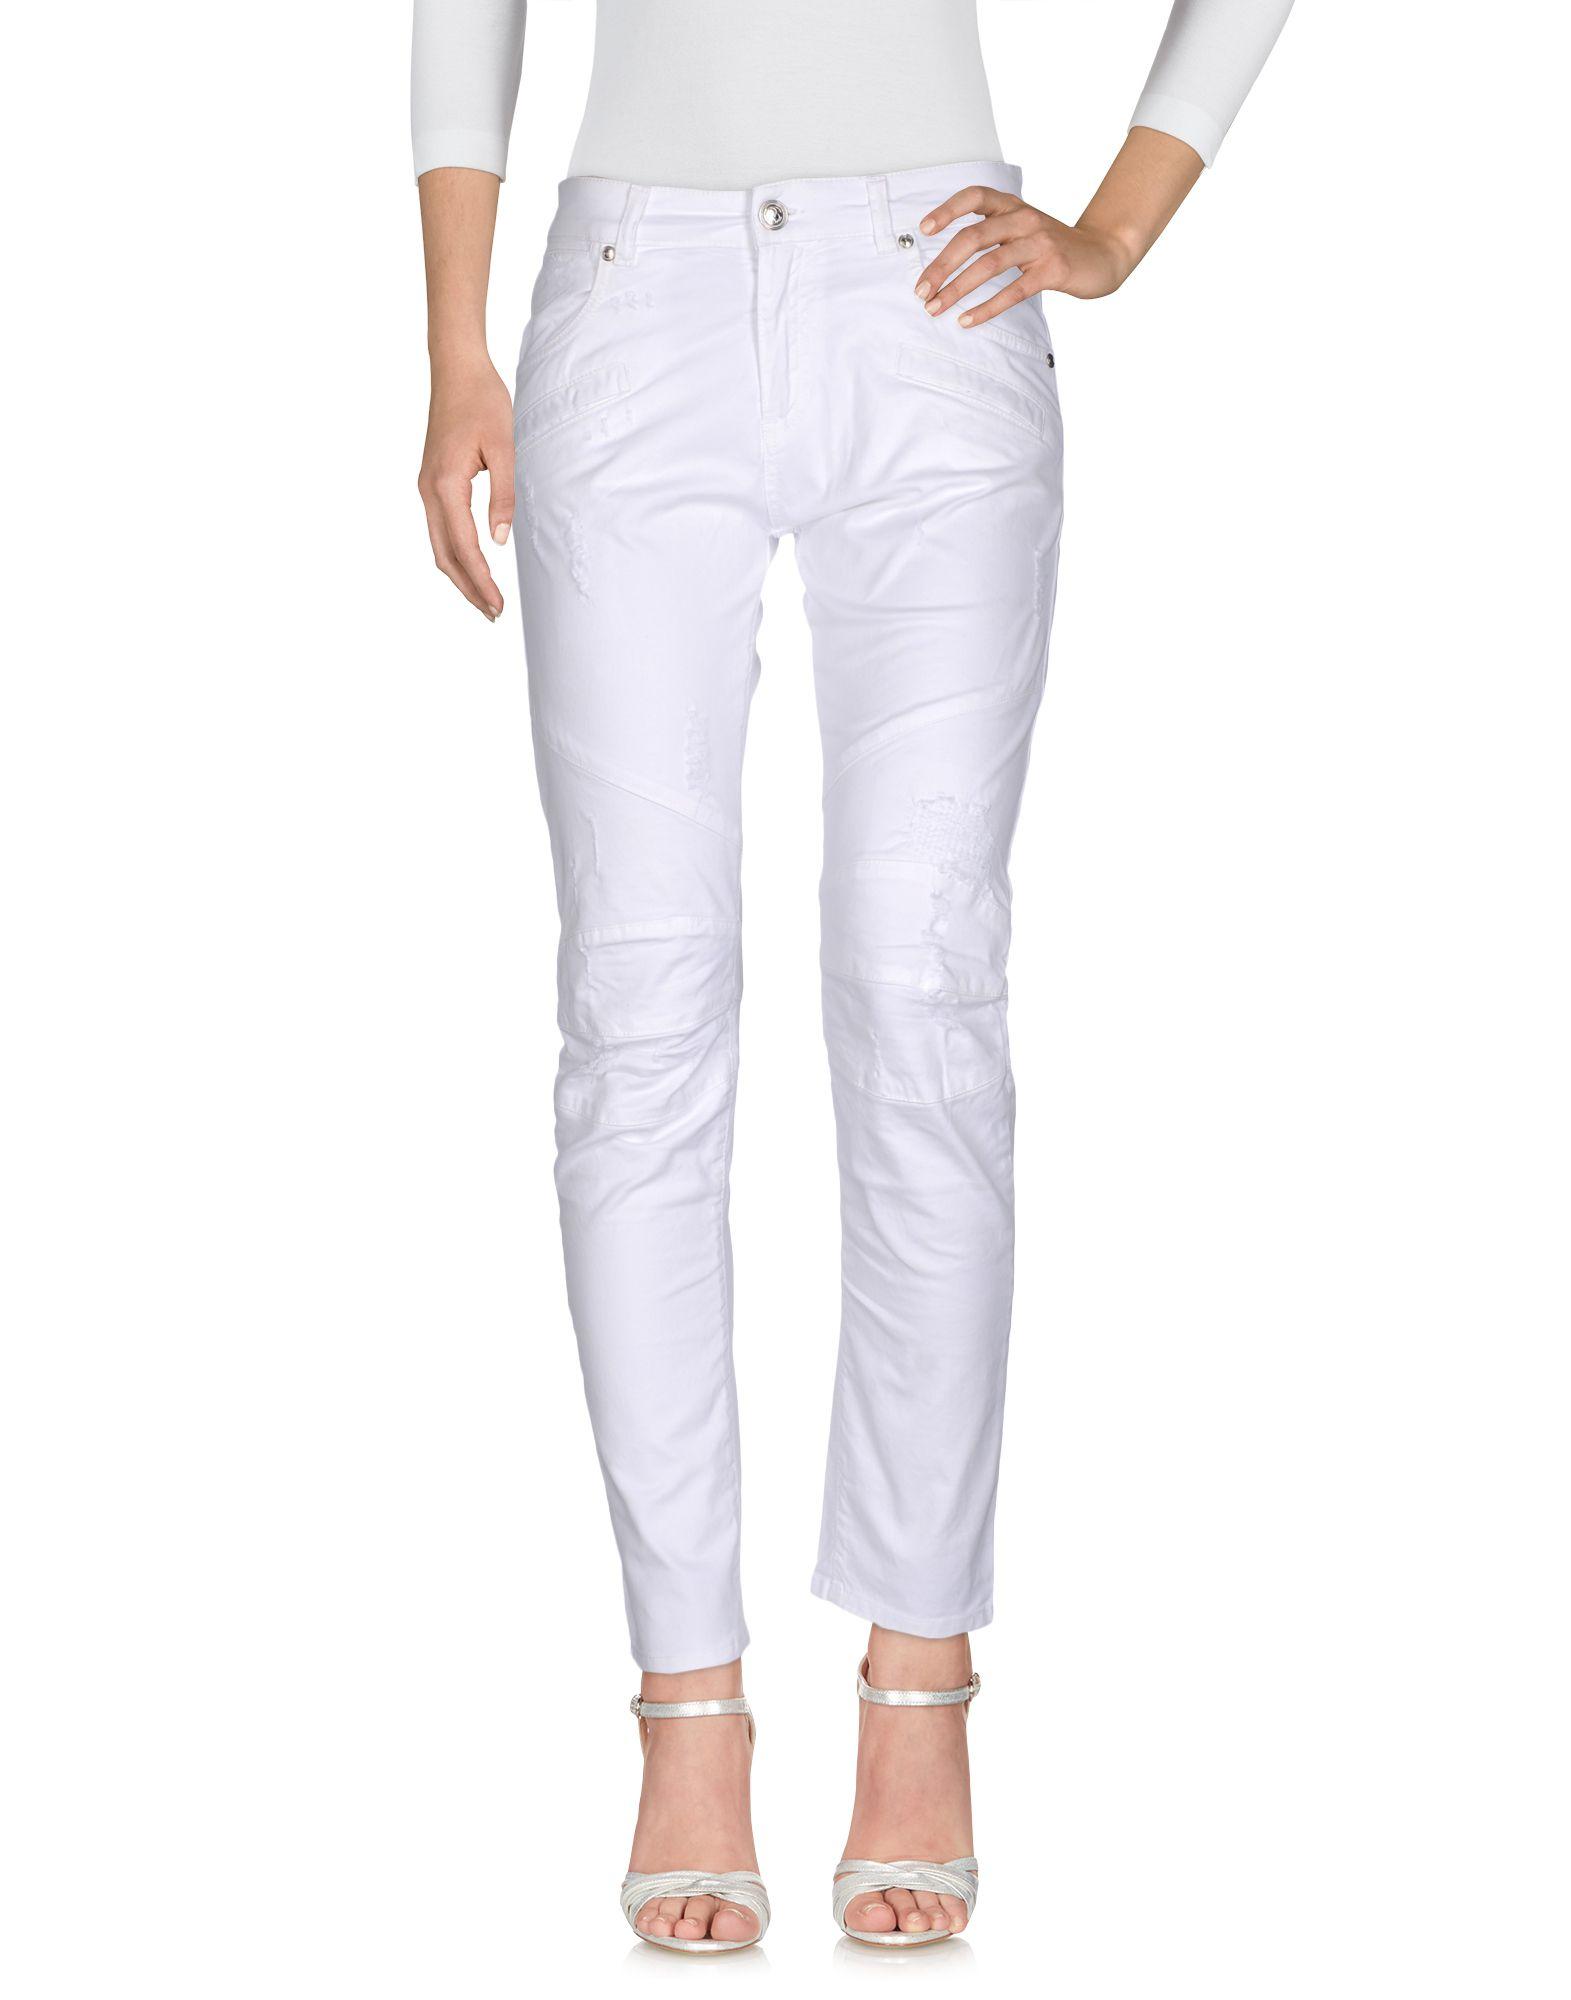 Pantaloni Jeans Pierre Balmain Donna - Acquista online su sWRnRQu59i